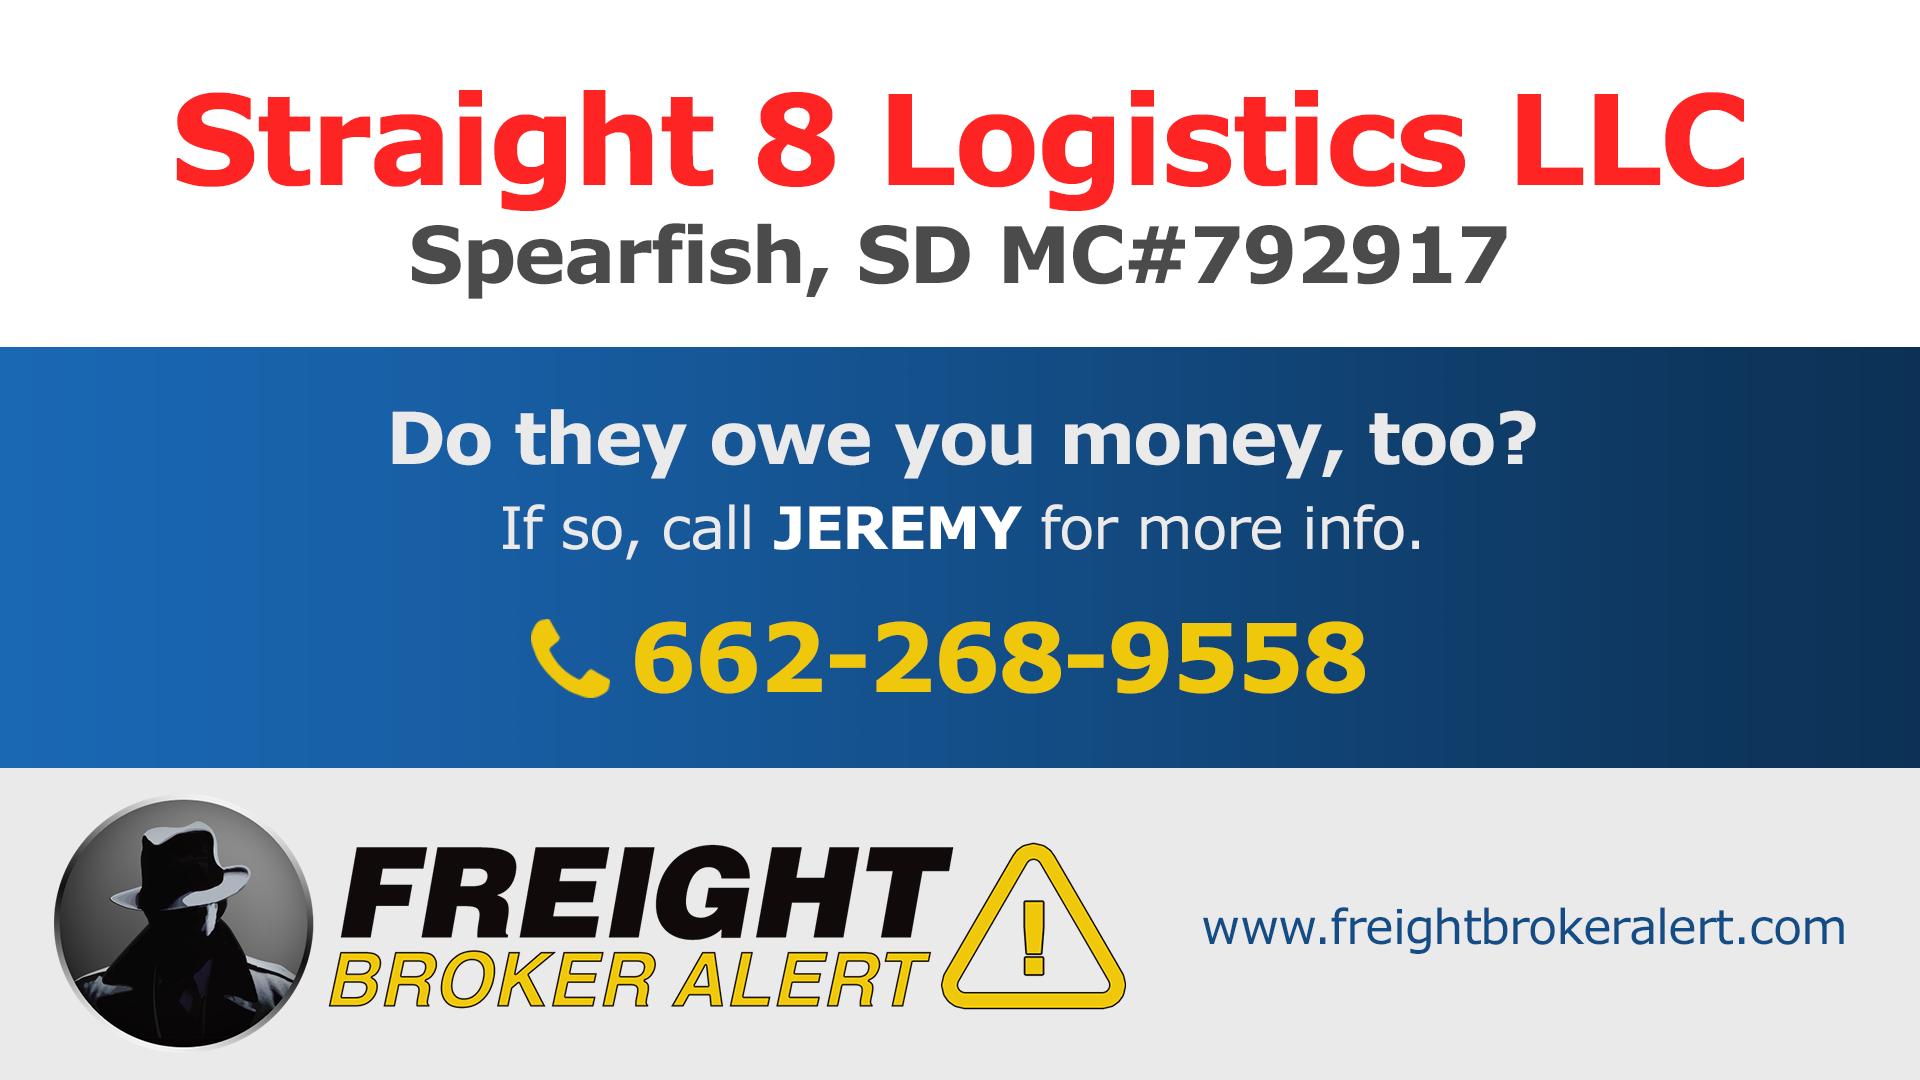 Straight 8 Logistics LLC South Dakota